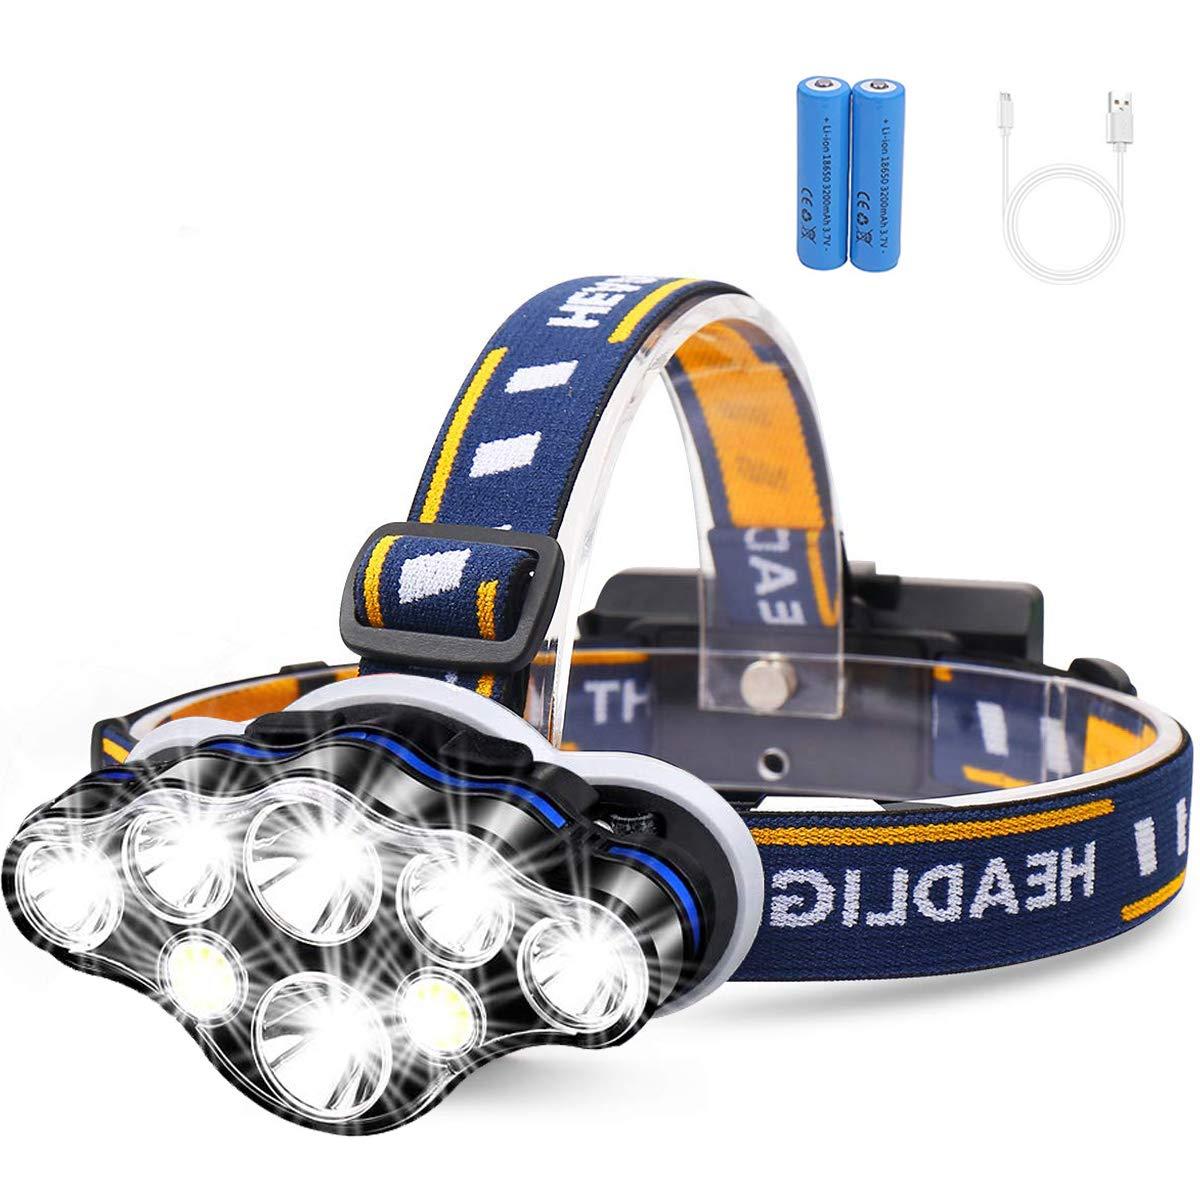 GM10201 8 LED USB High lumen Rechargeable Headlamp